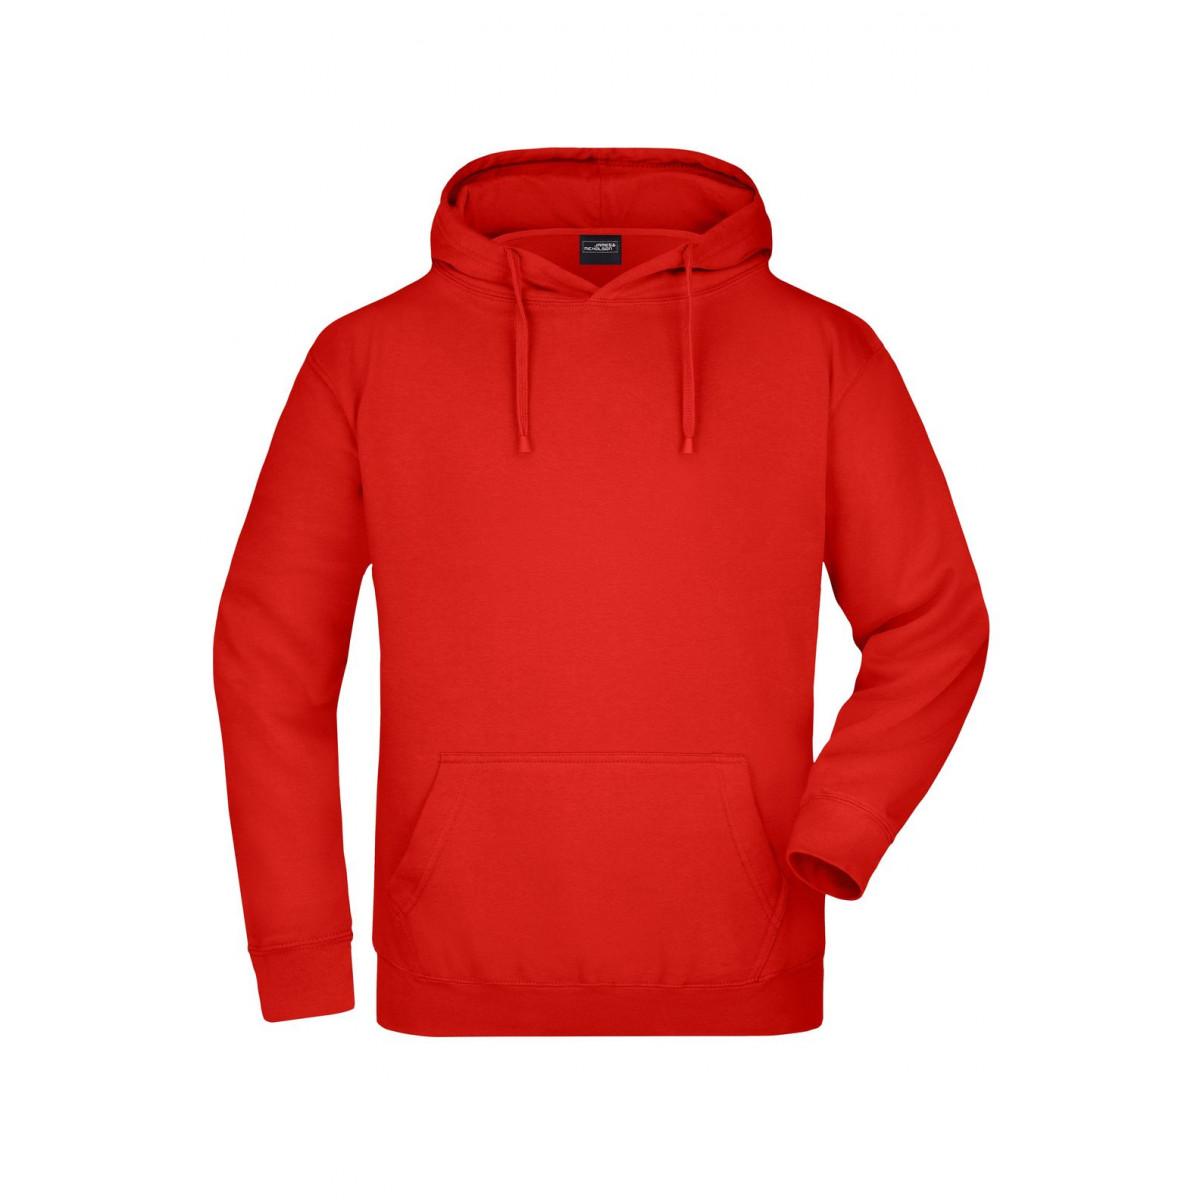 Толстовка мужская JN047 Hooded Sweat - Томатный